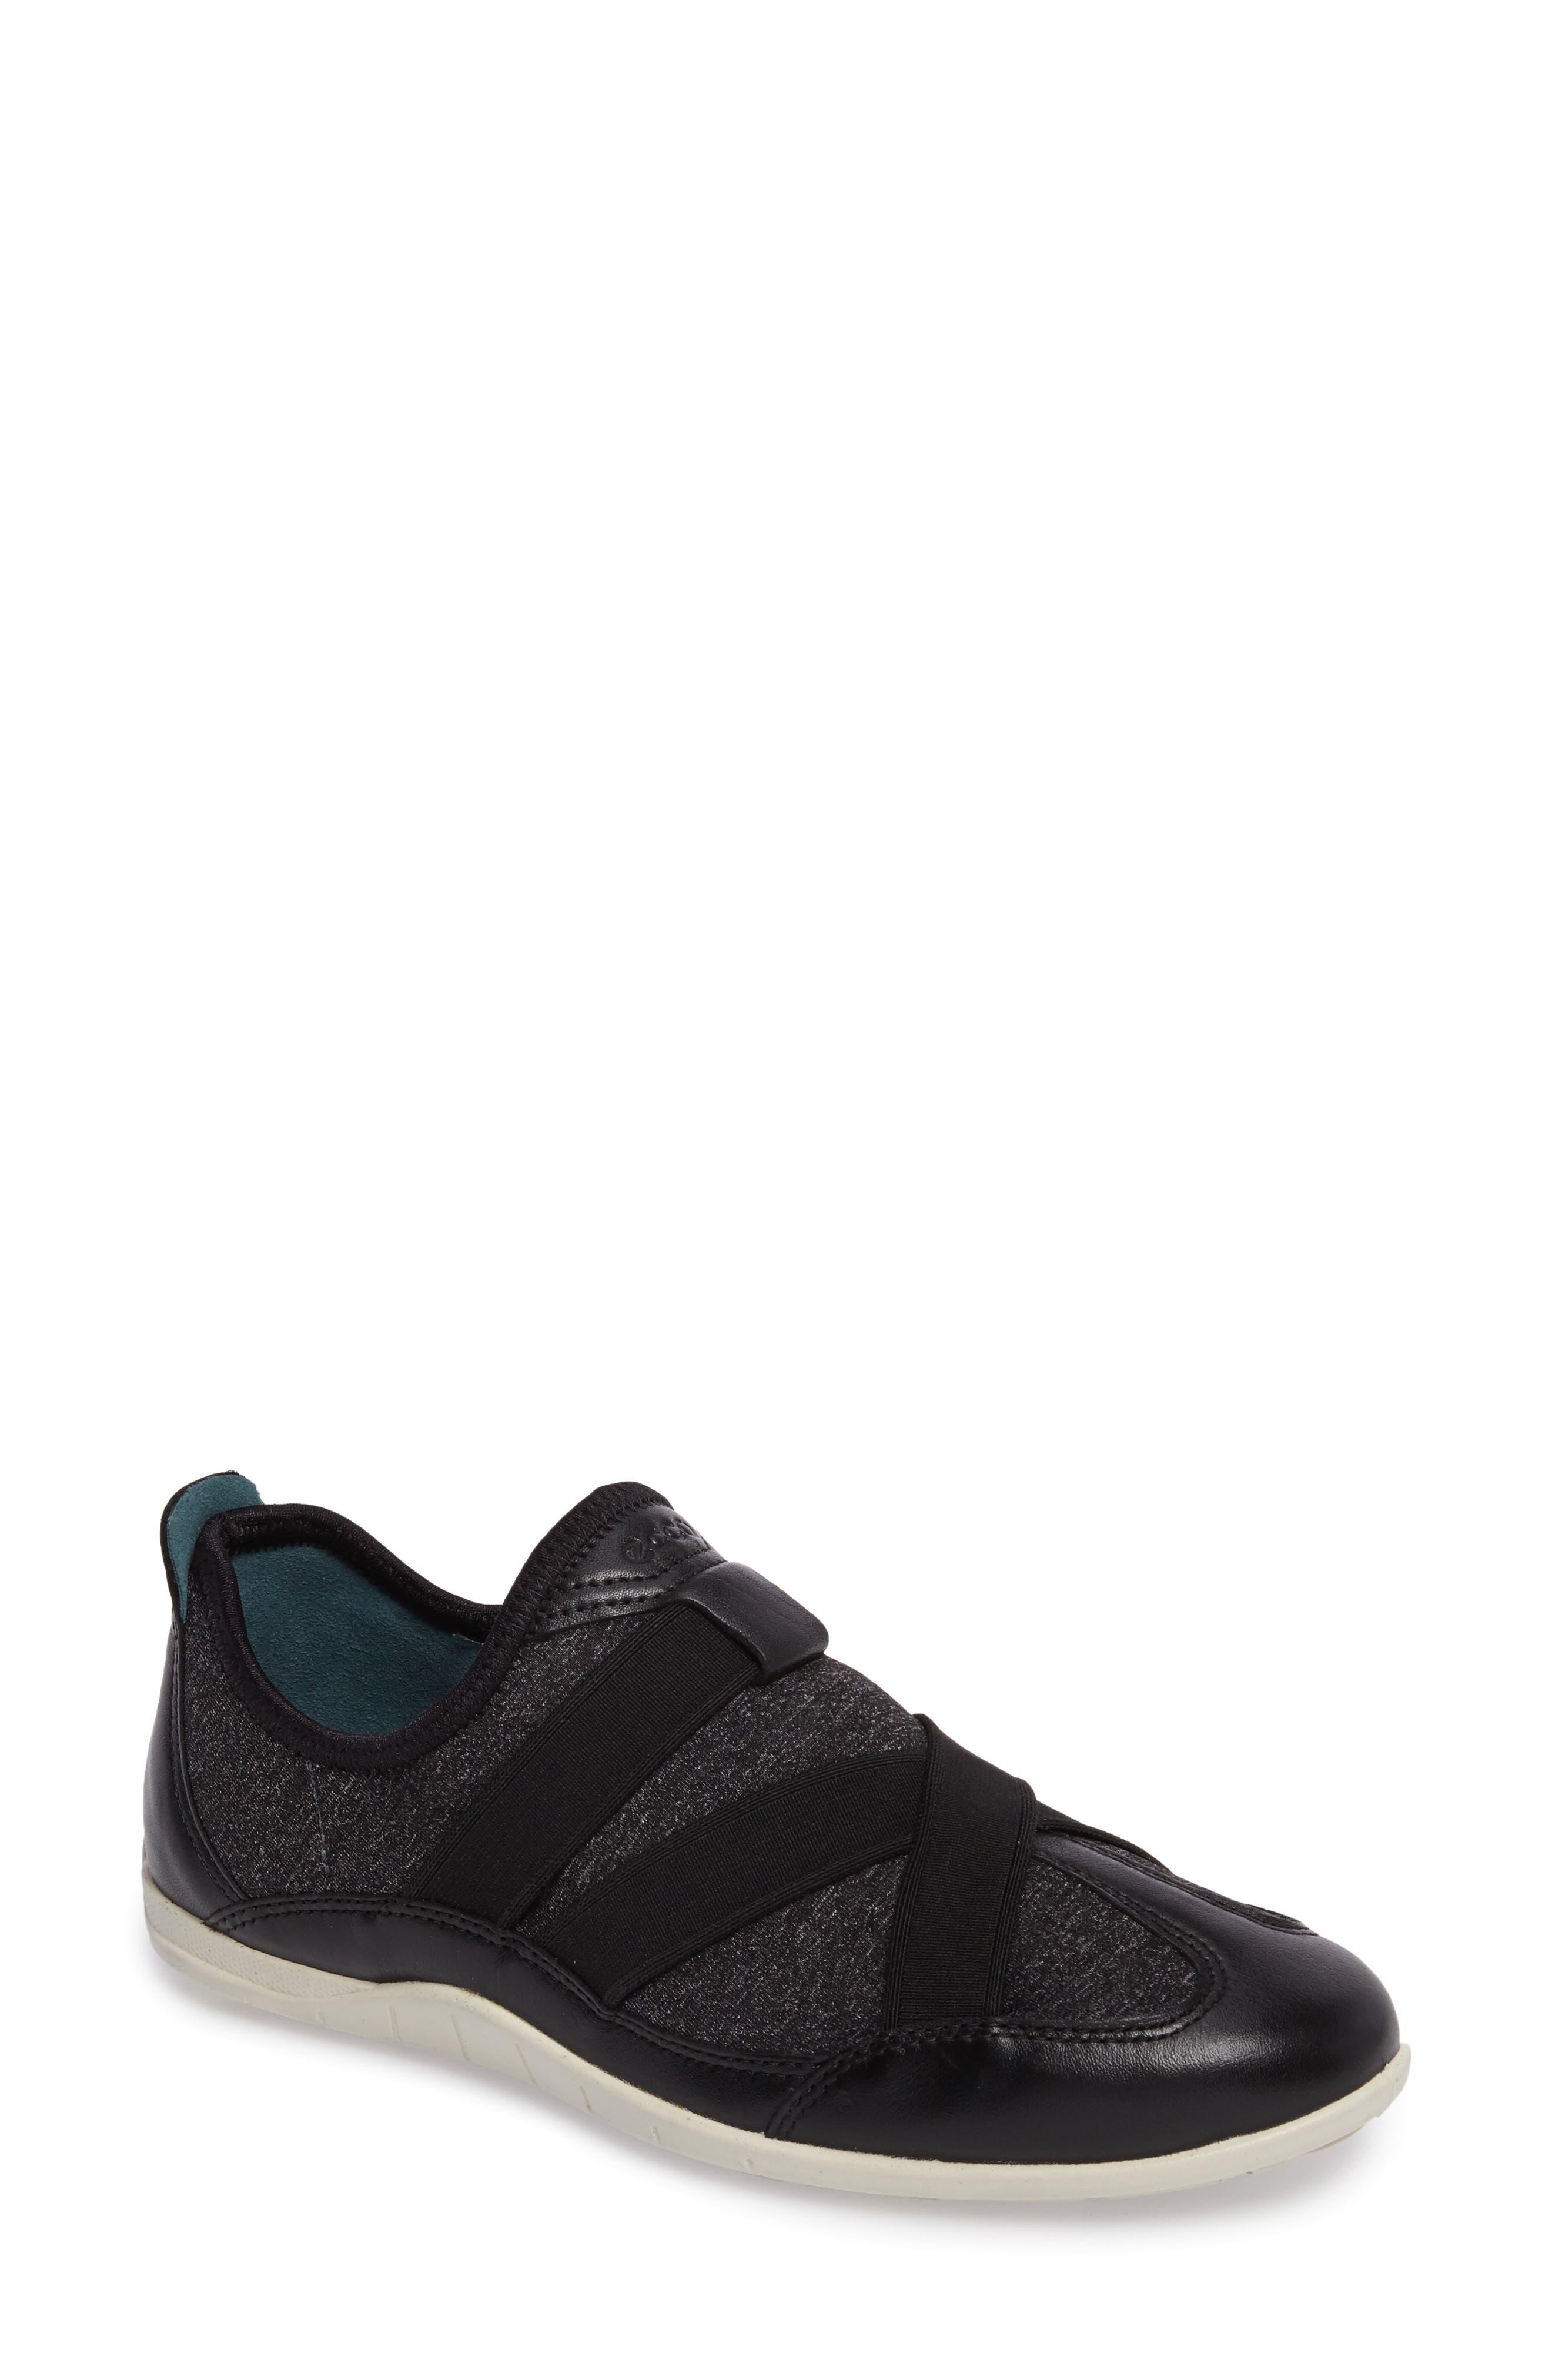 'Bluma' Sneaker,                         Main,                         color, 010